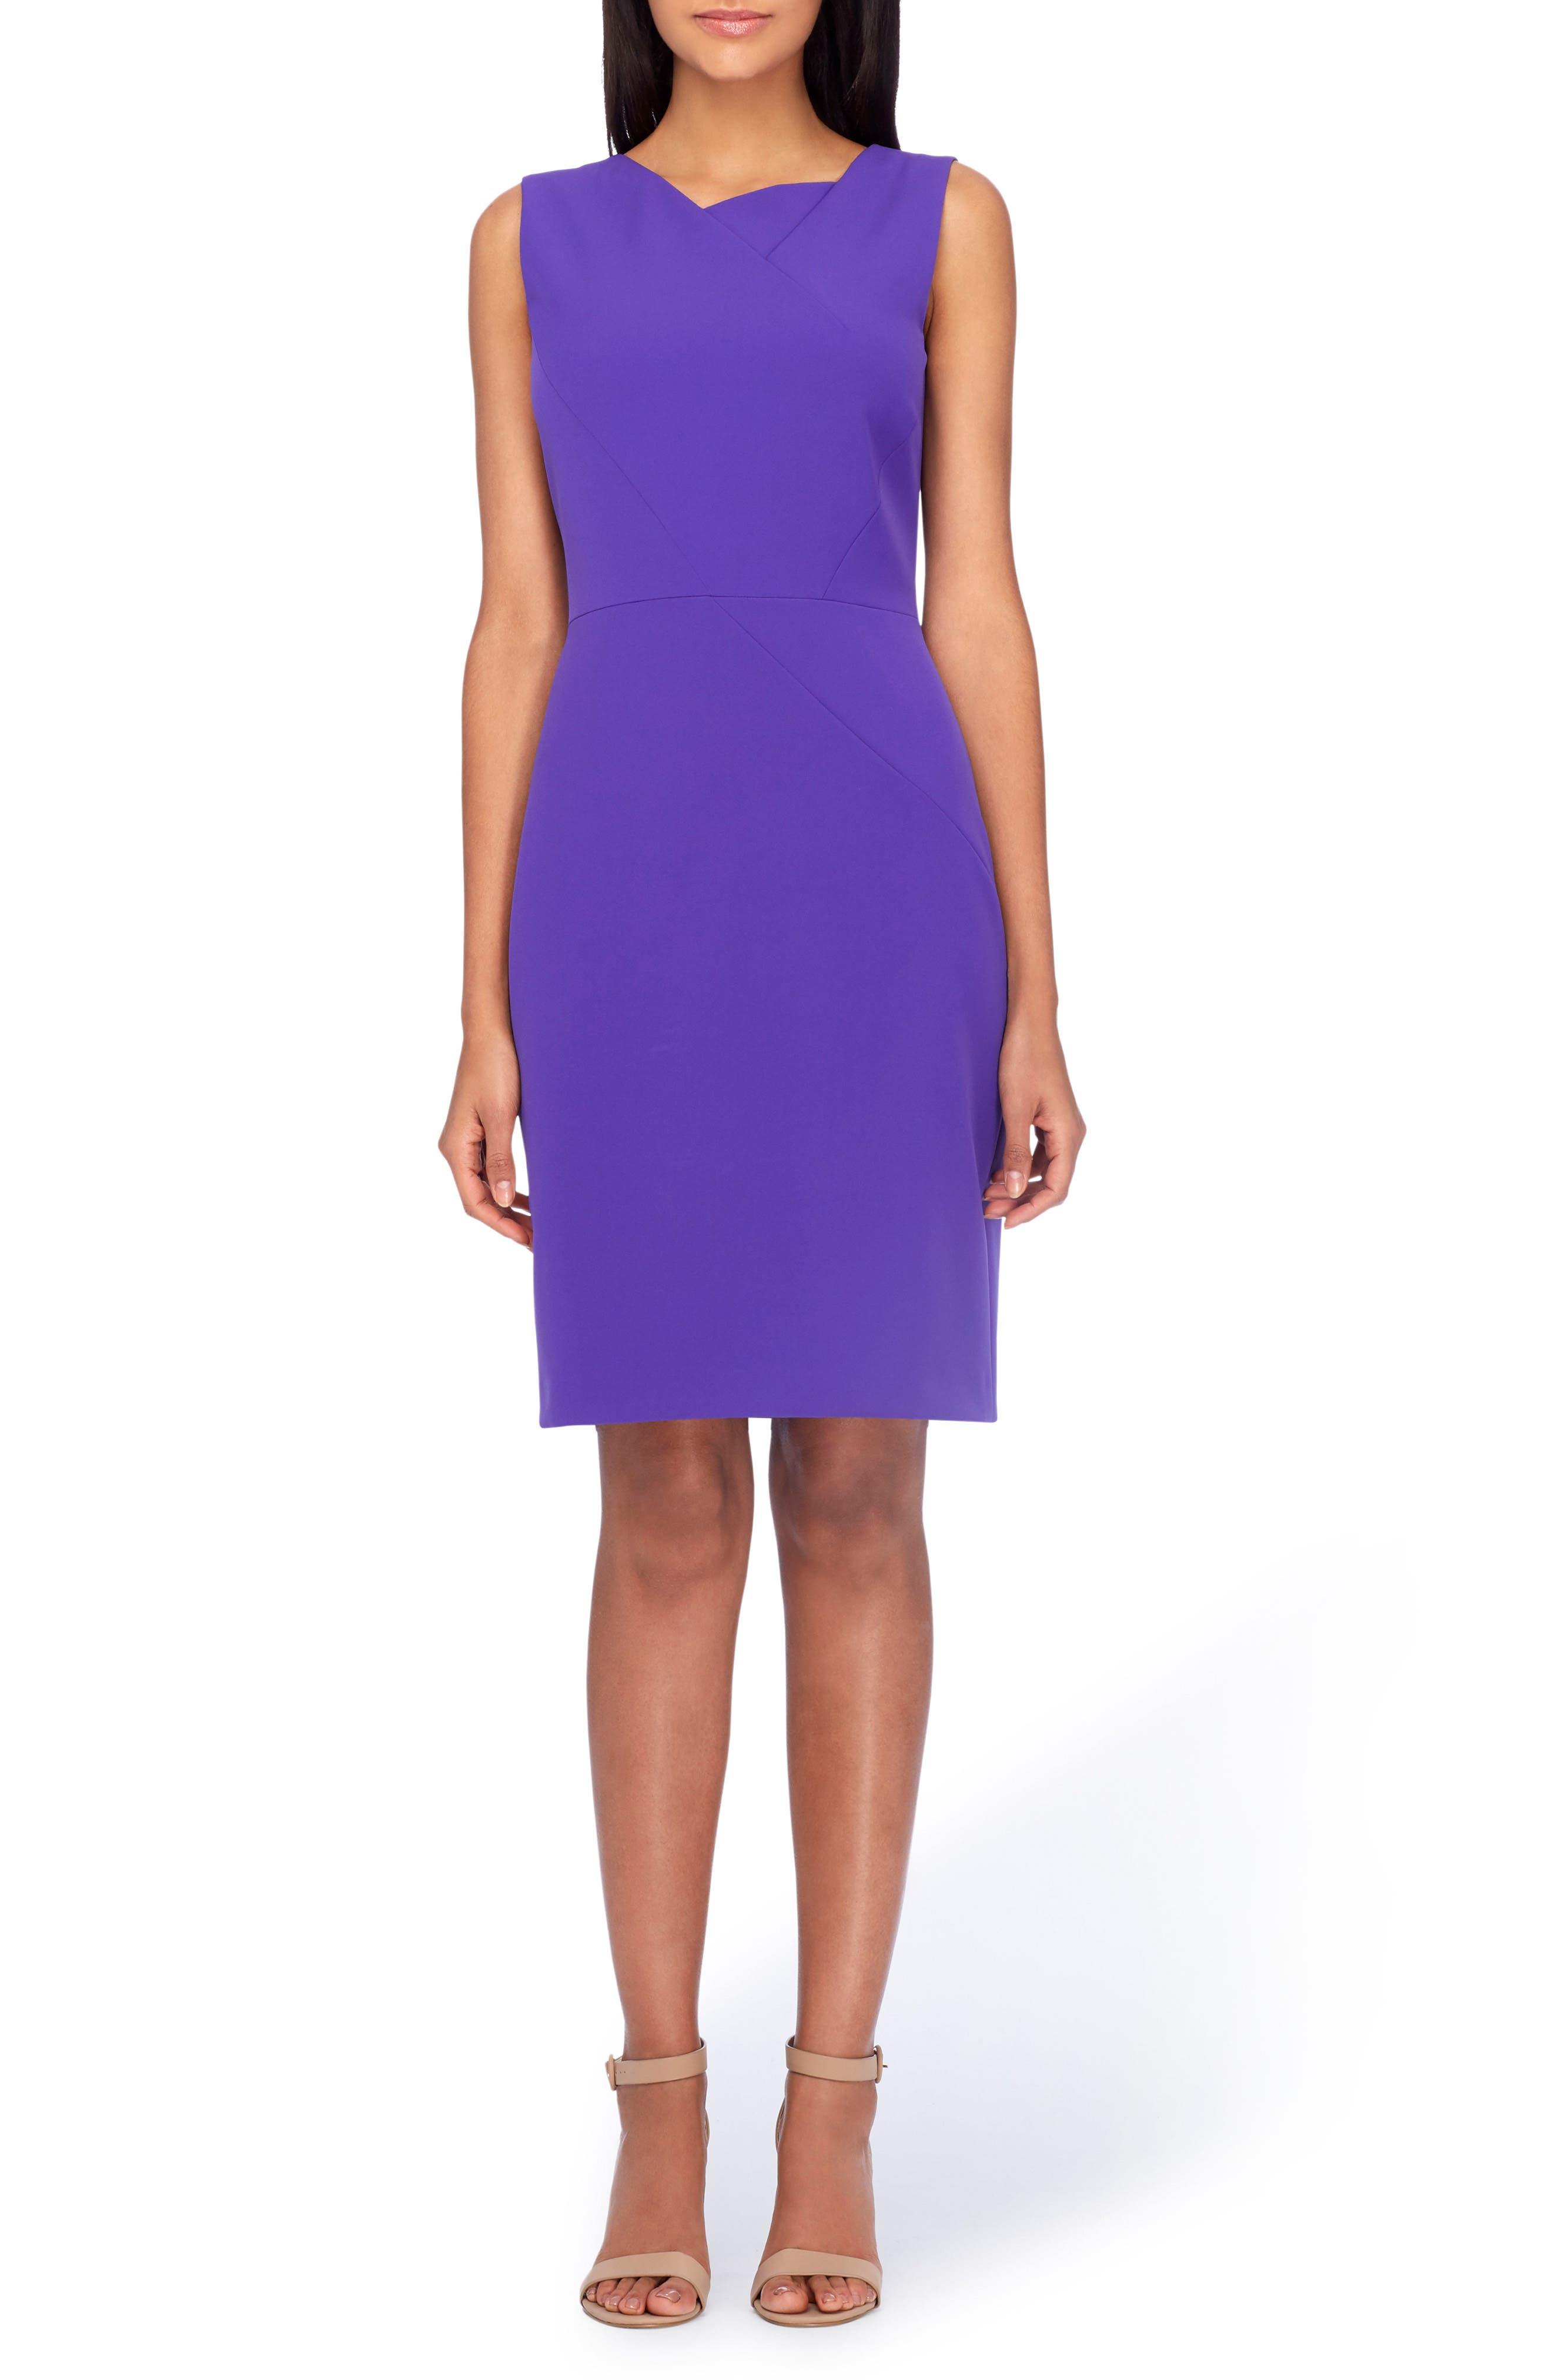 Alternate Image 1 Selected - Tahari Asymmetrical Sheath Dress (Regular & Petite)